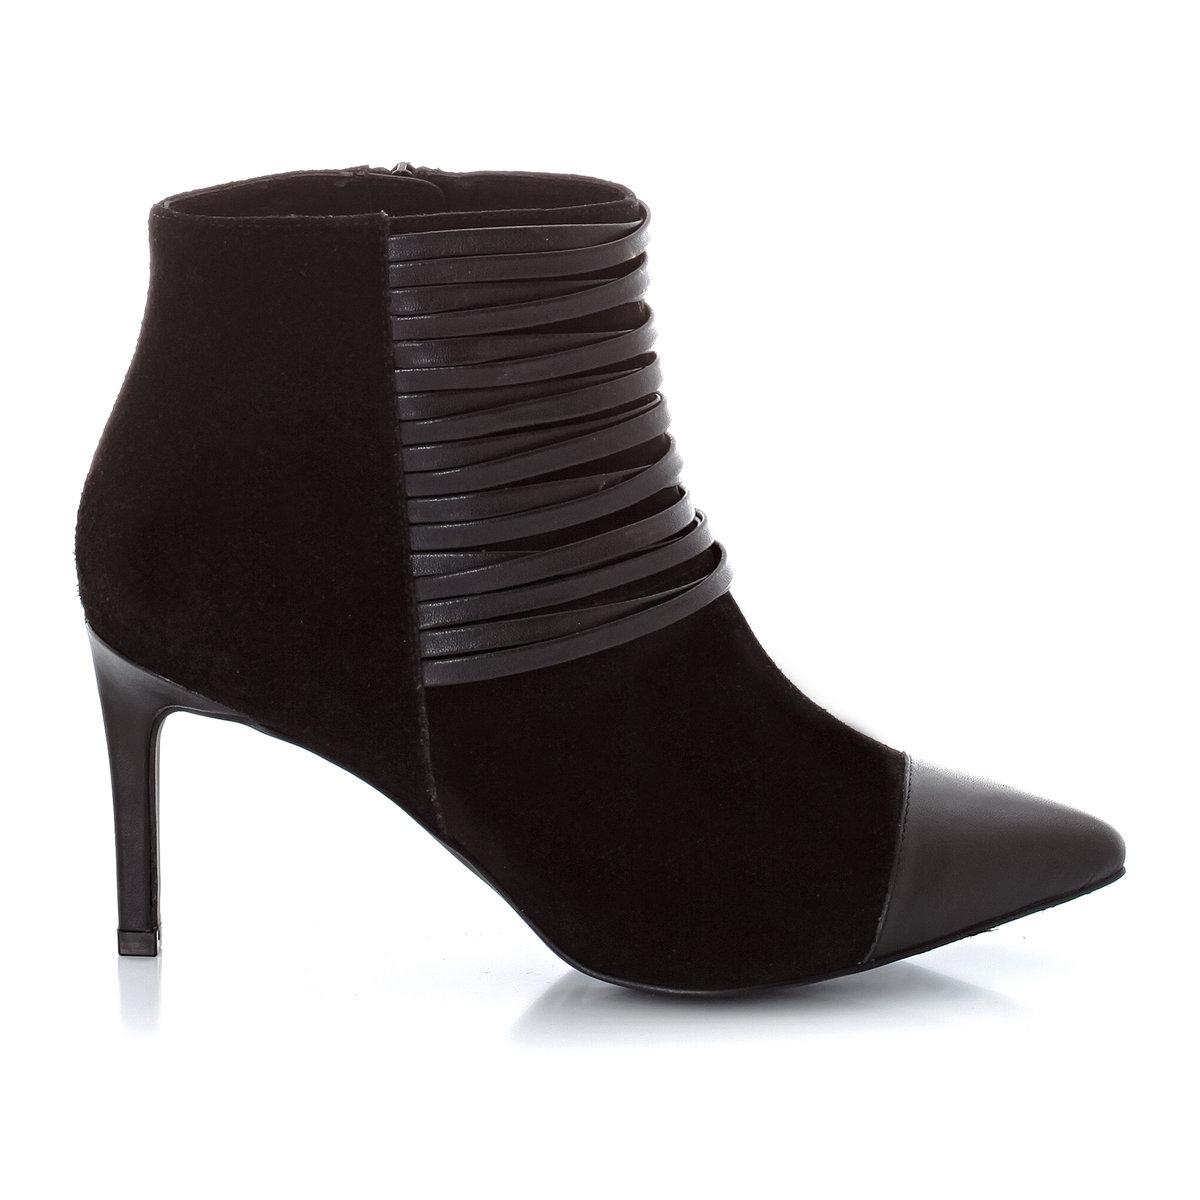 Ботильоны кожаные на каблуке<br><br>Цвет: черный<br>Размер: 41